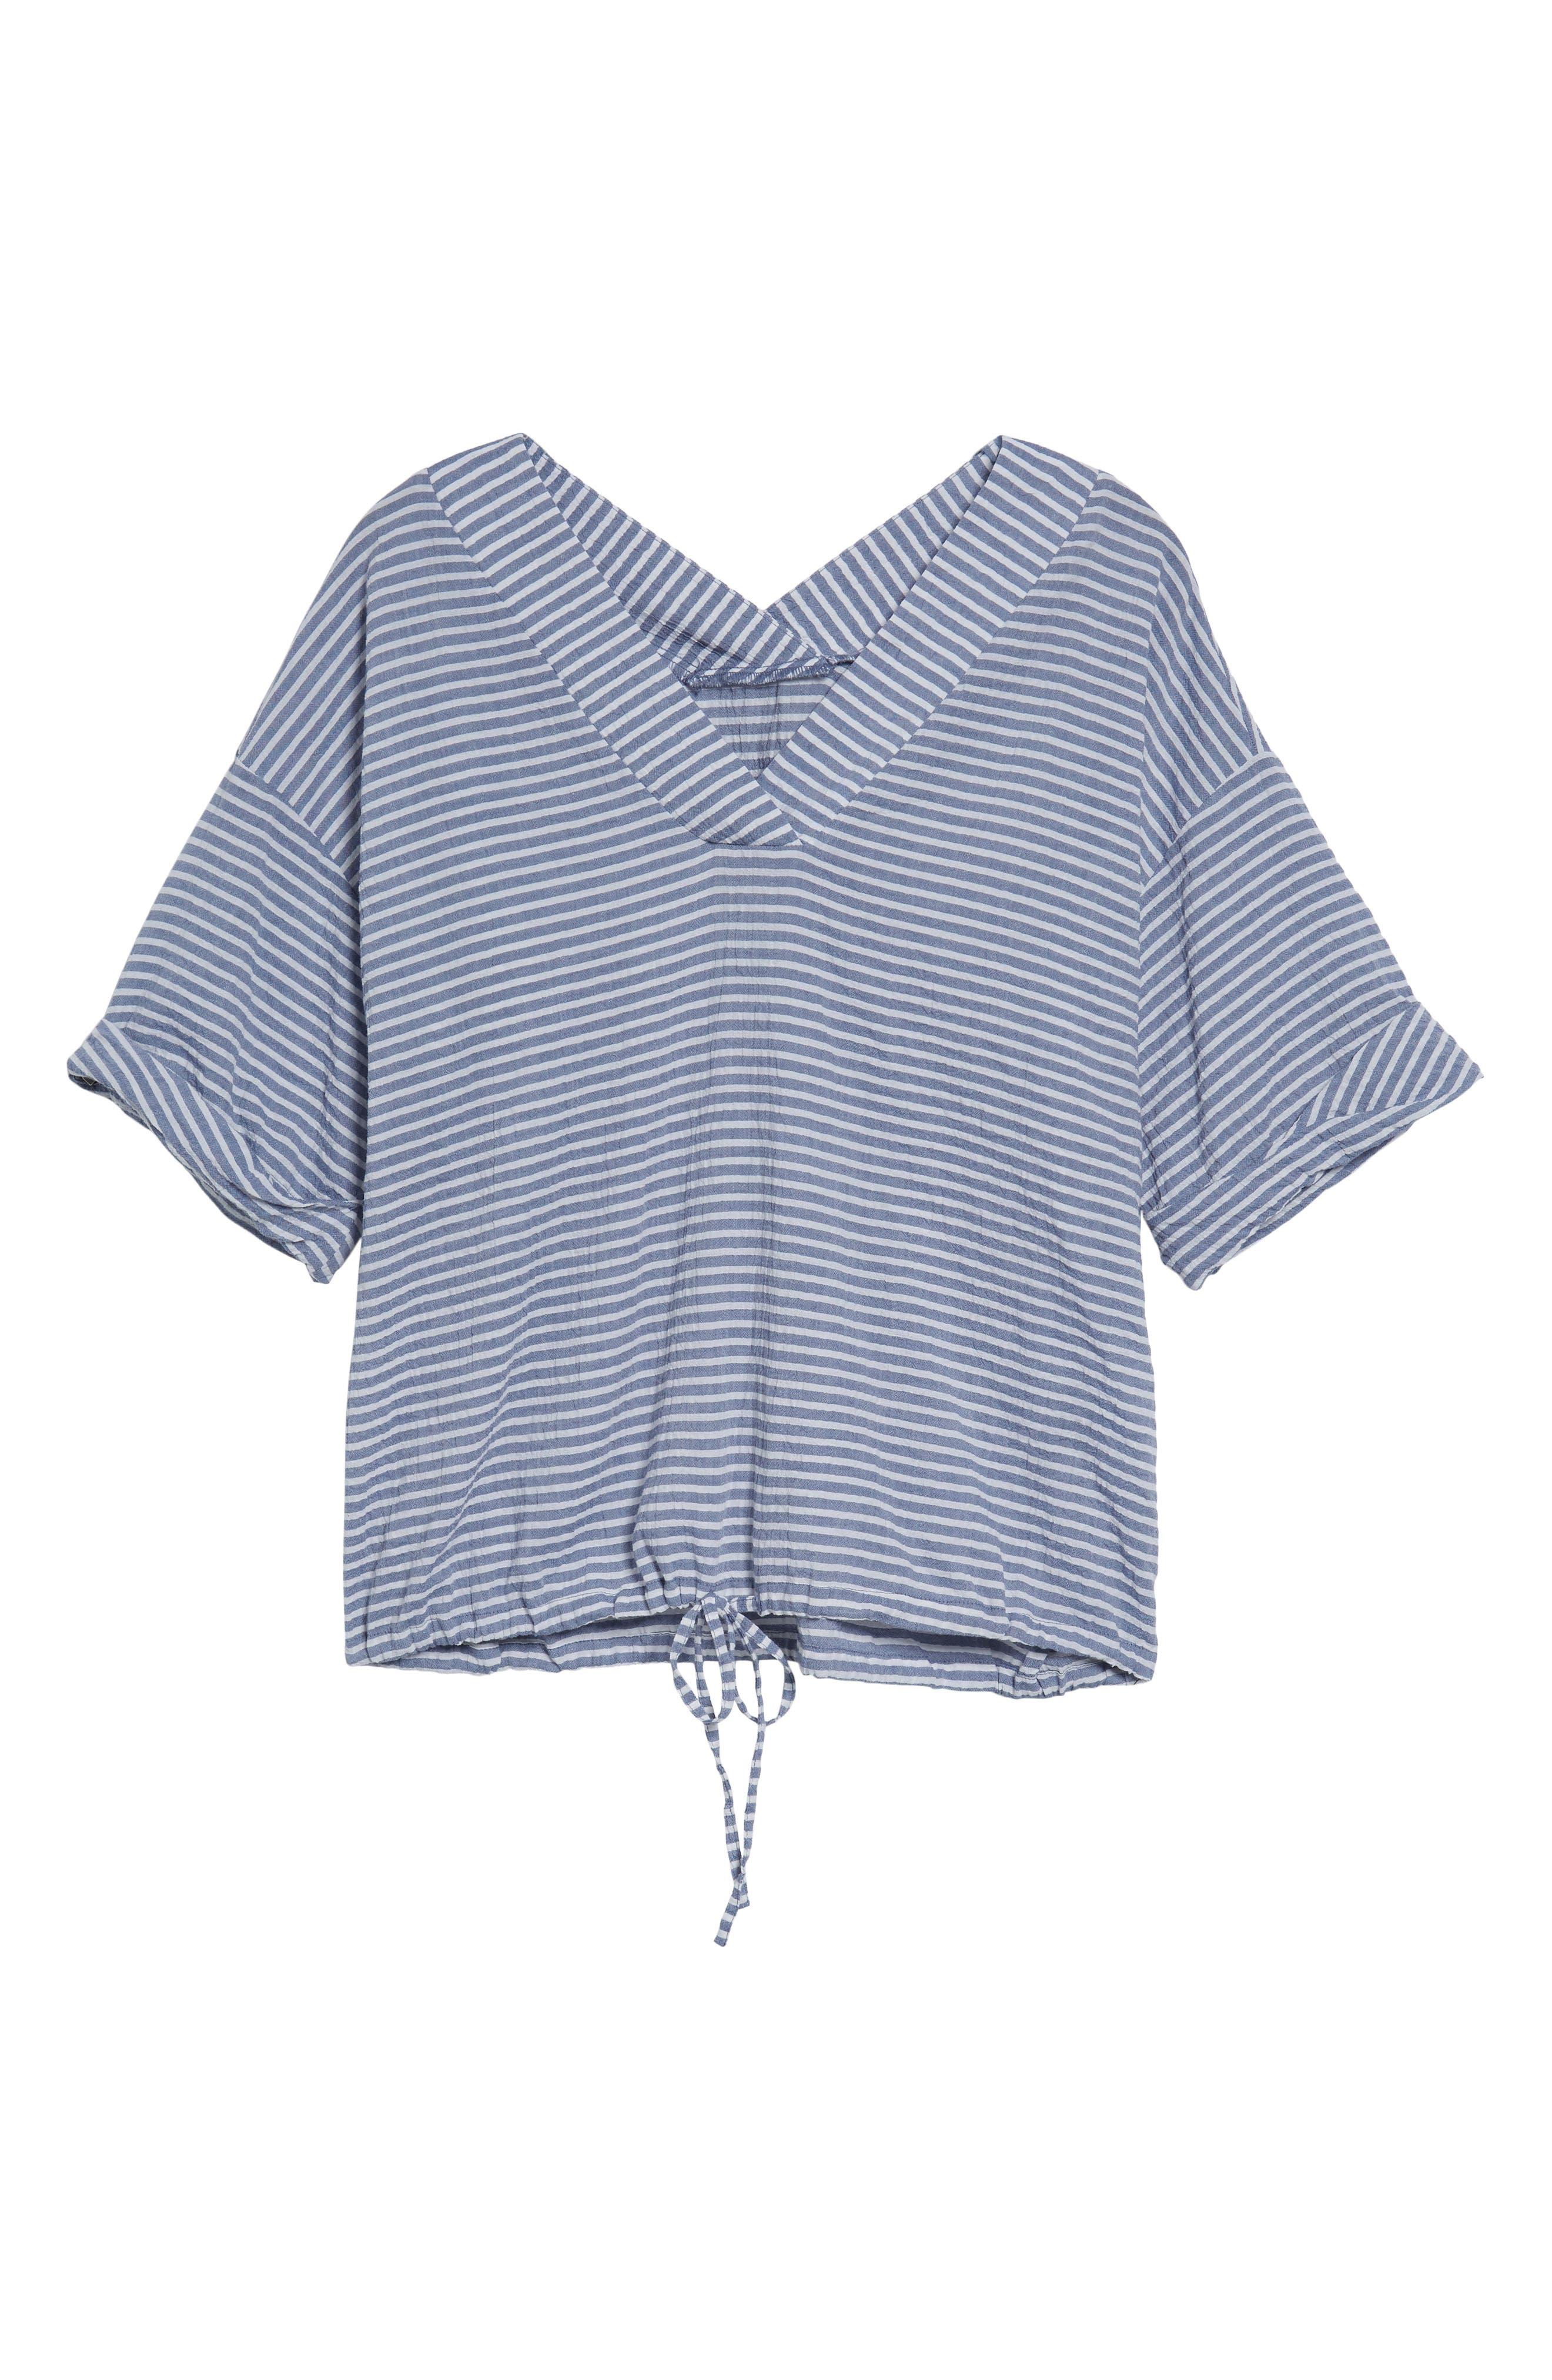 Tie Waist Stripe Seersucker Top,                             Alternate thumbnail 6, color,                             Blue- White Stripe